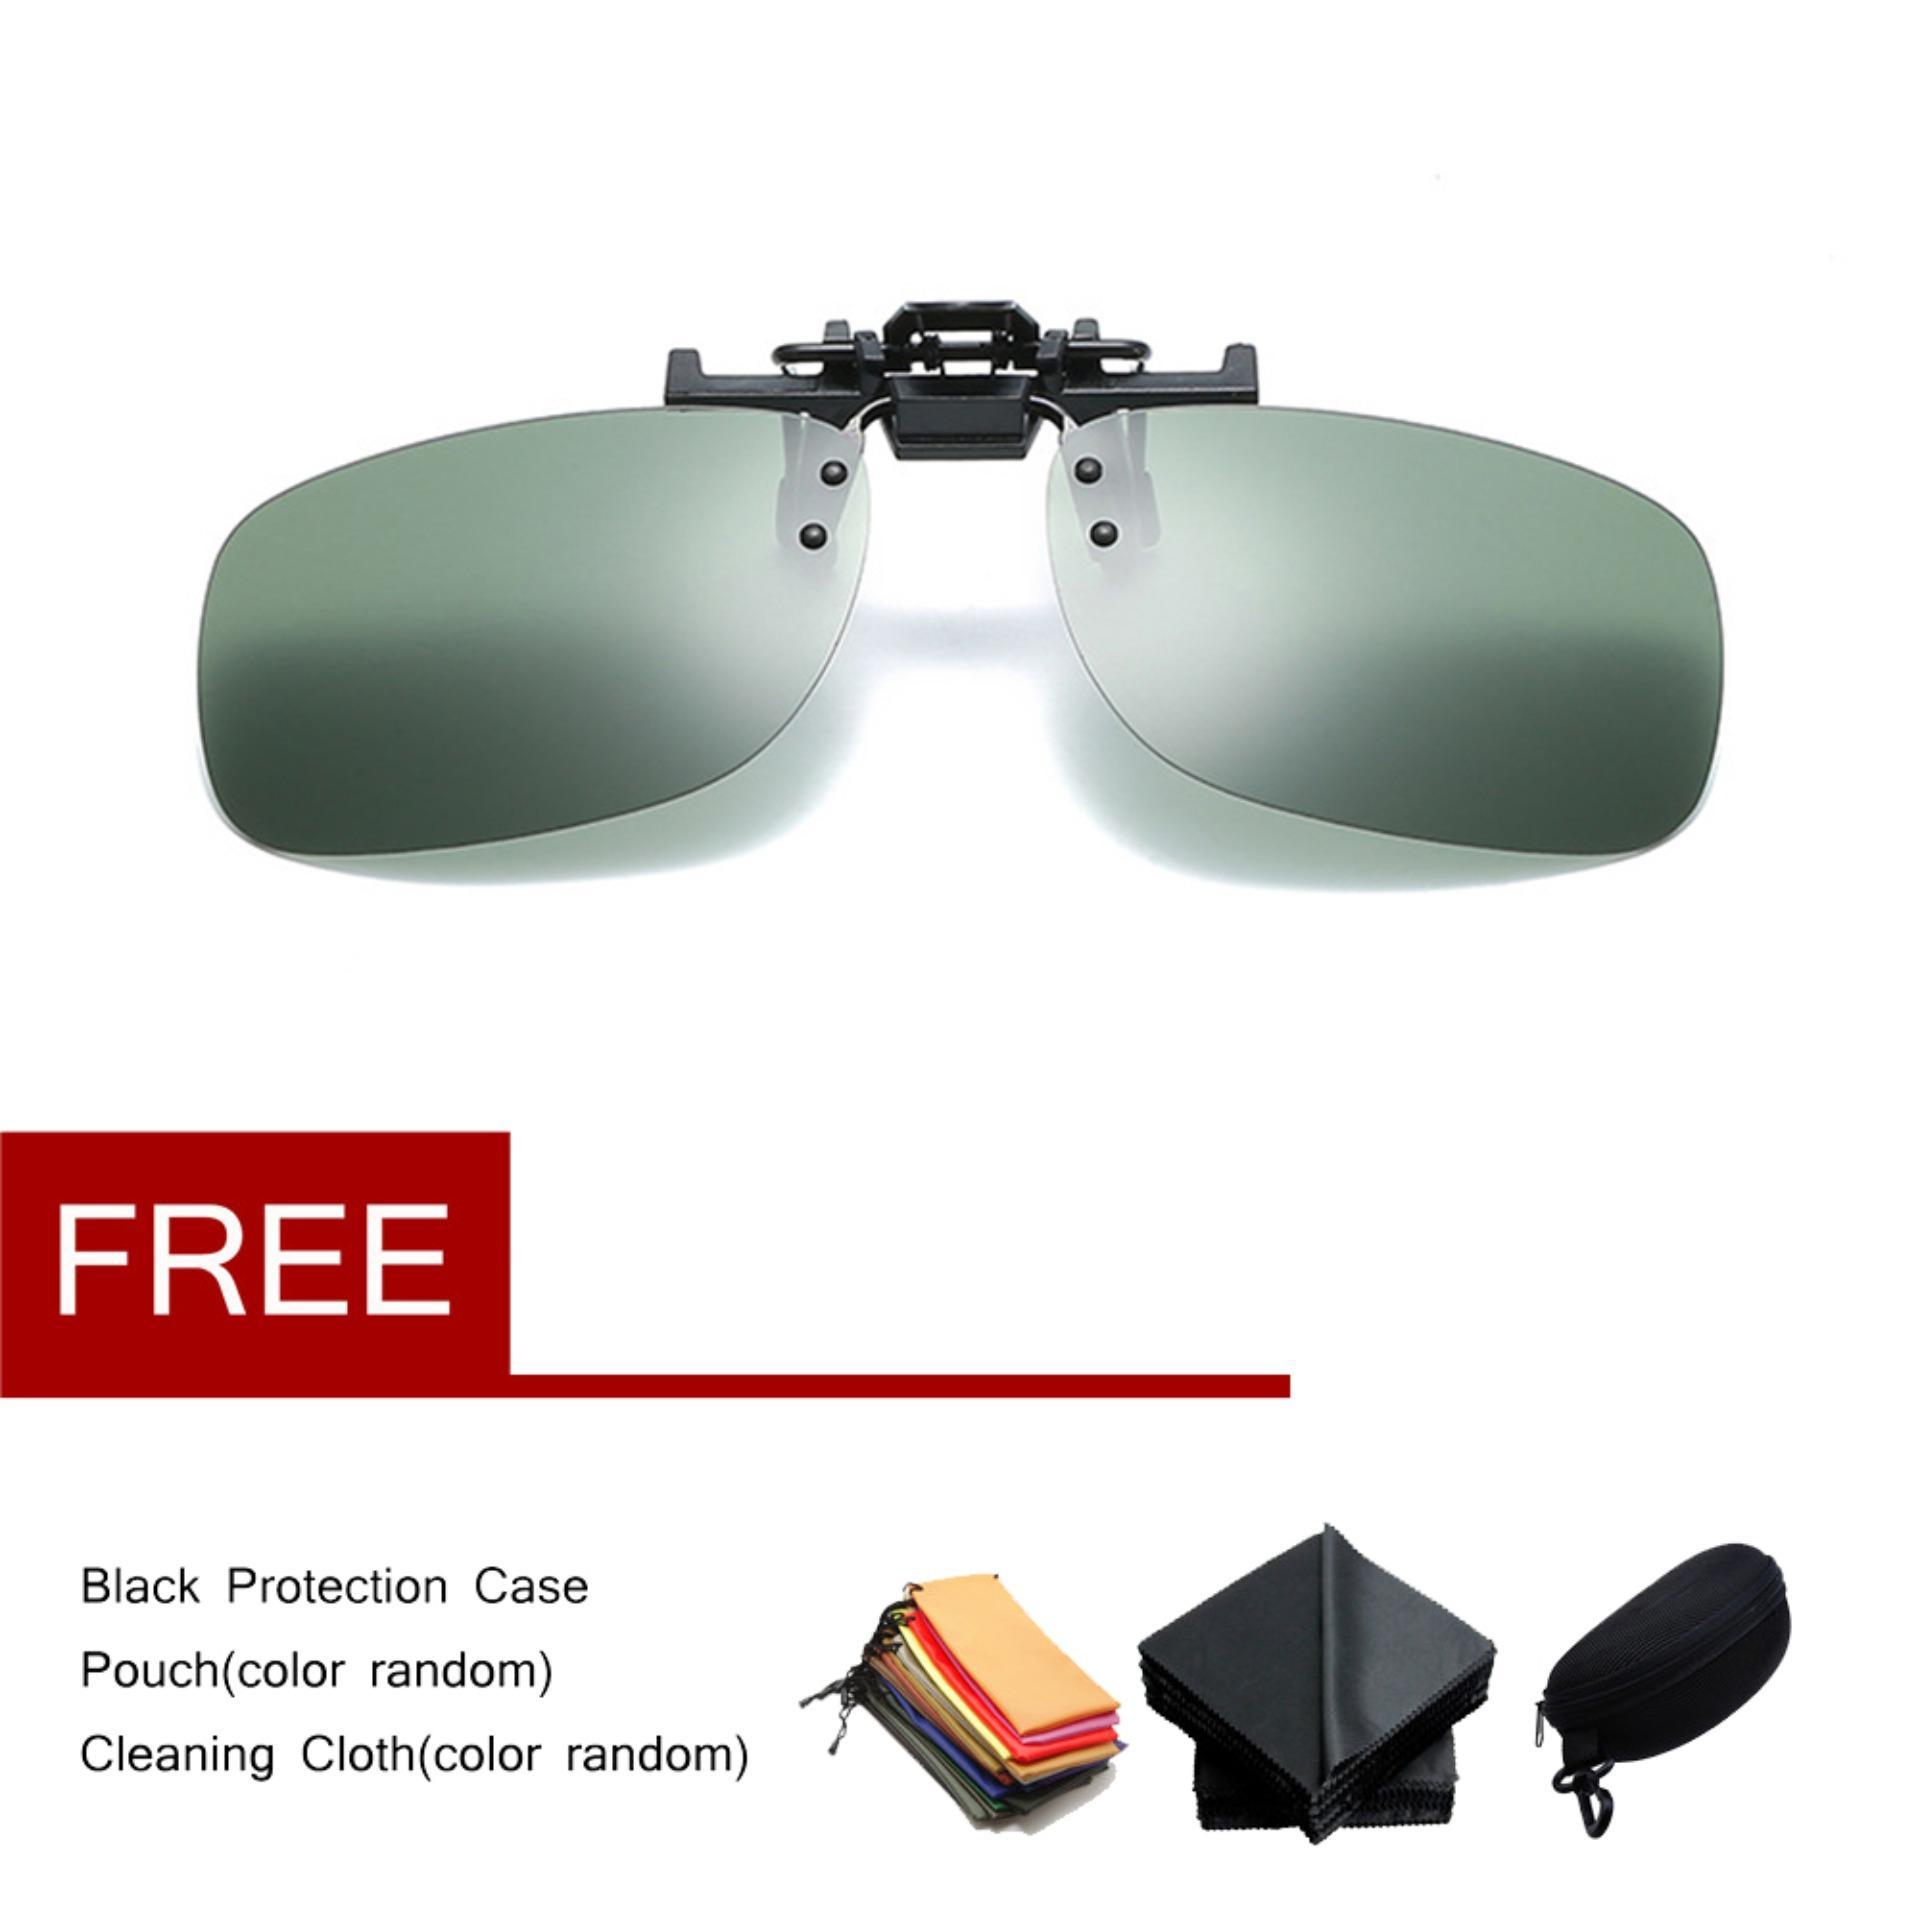 5e4c64006b Hot Sale Fashion Polarized Lens UV400 Clip on Sunglasses Driving Glasses  Day Night Vision